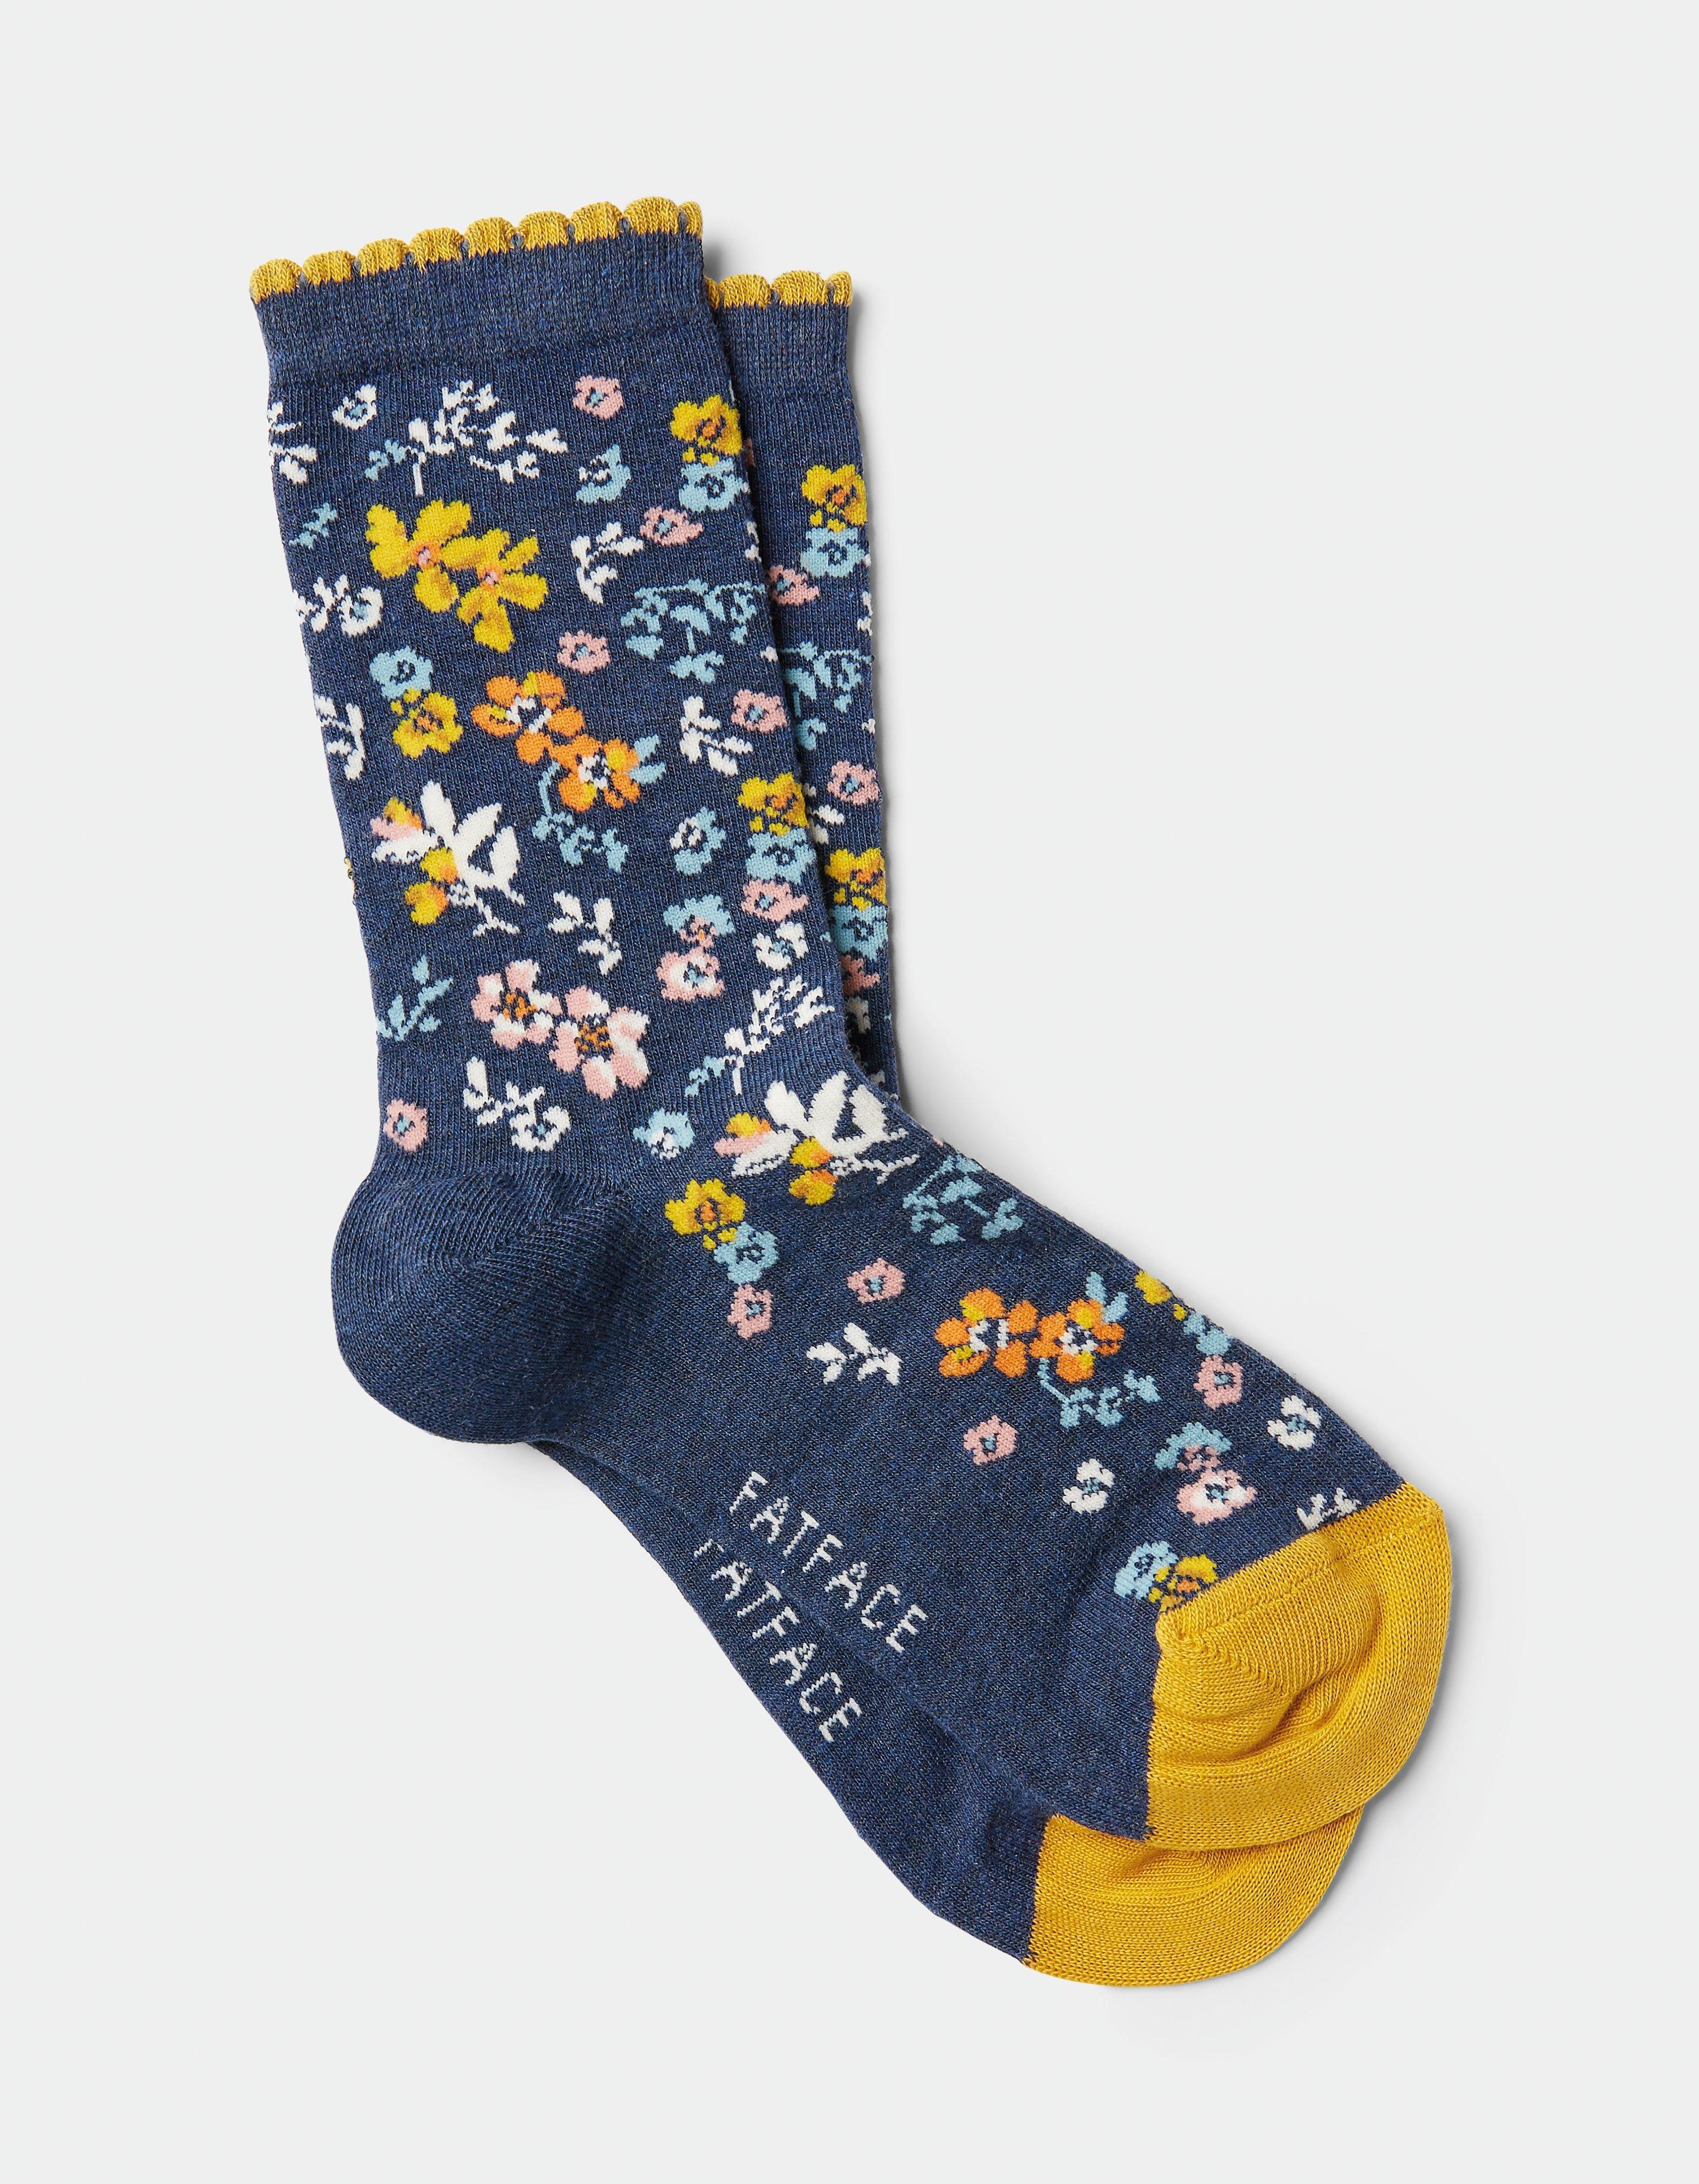 NEW w Tags Ships FREE USA Blue Q Socks Women/'s Crew // /& Ankle  Funny Socks